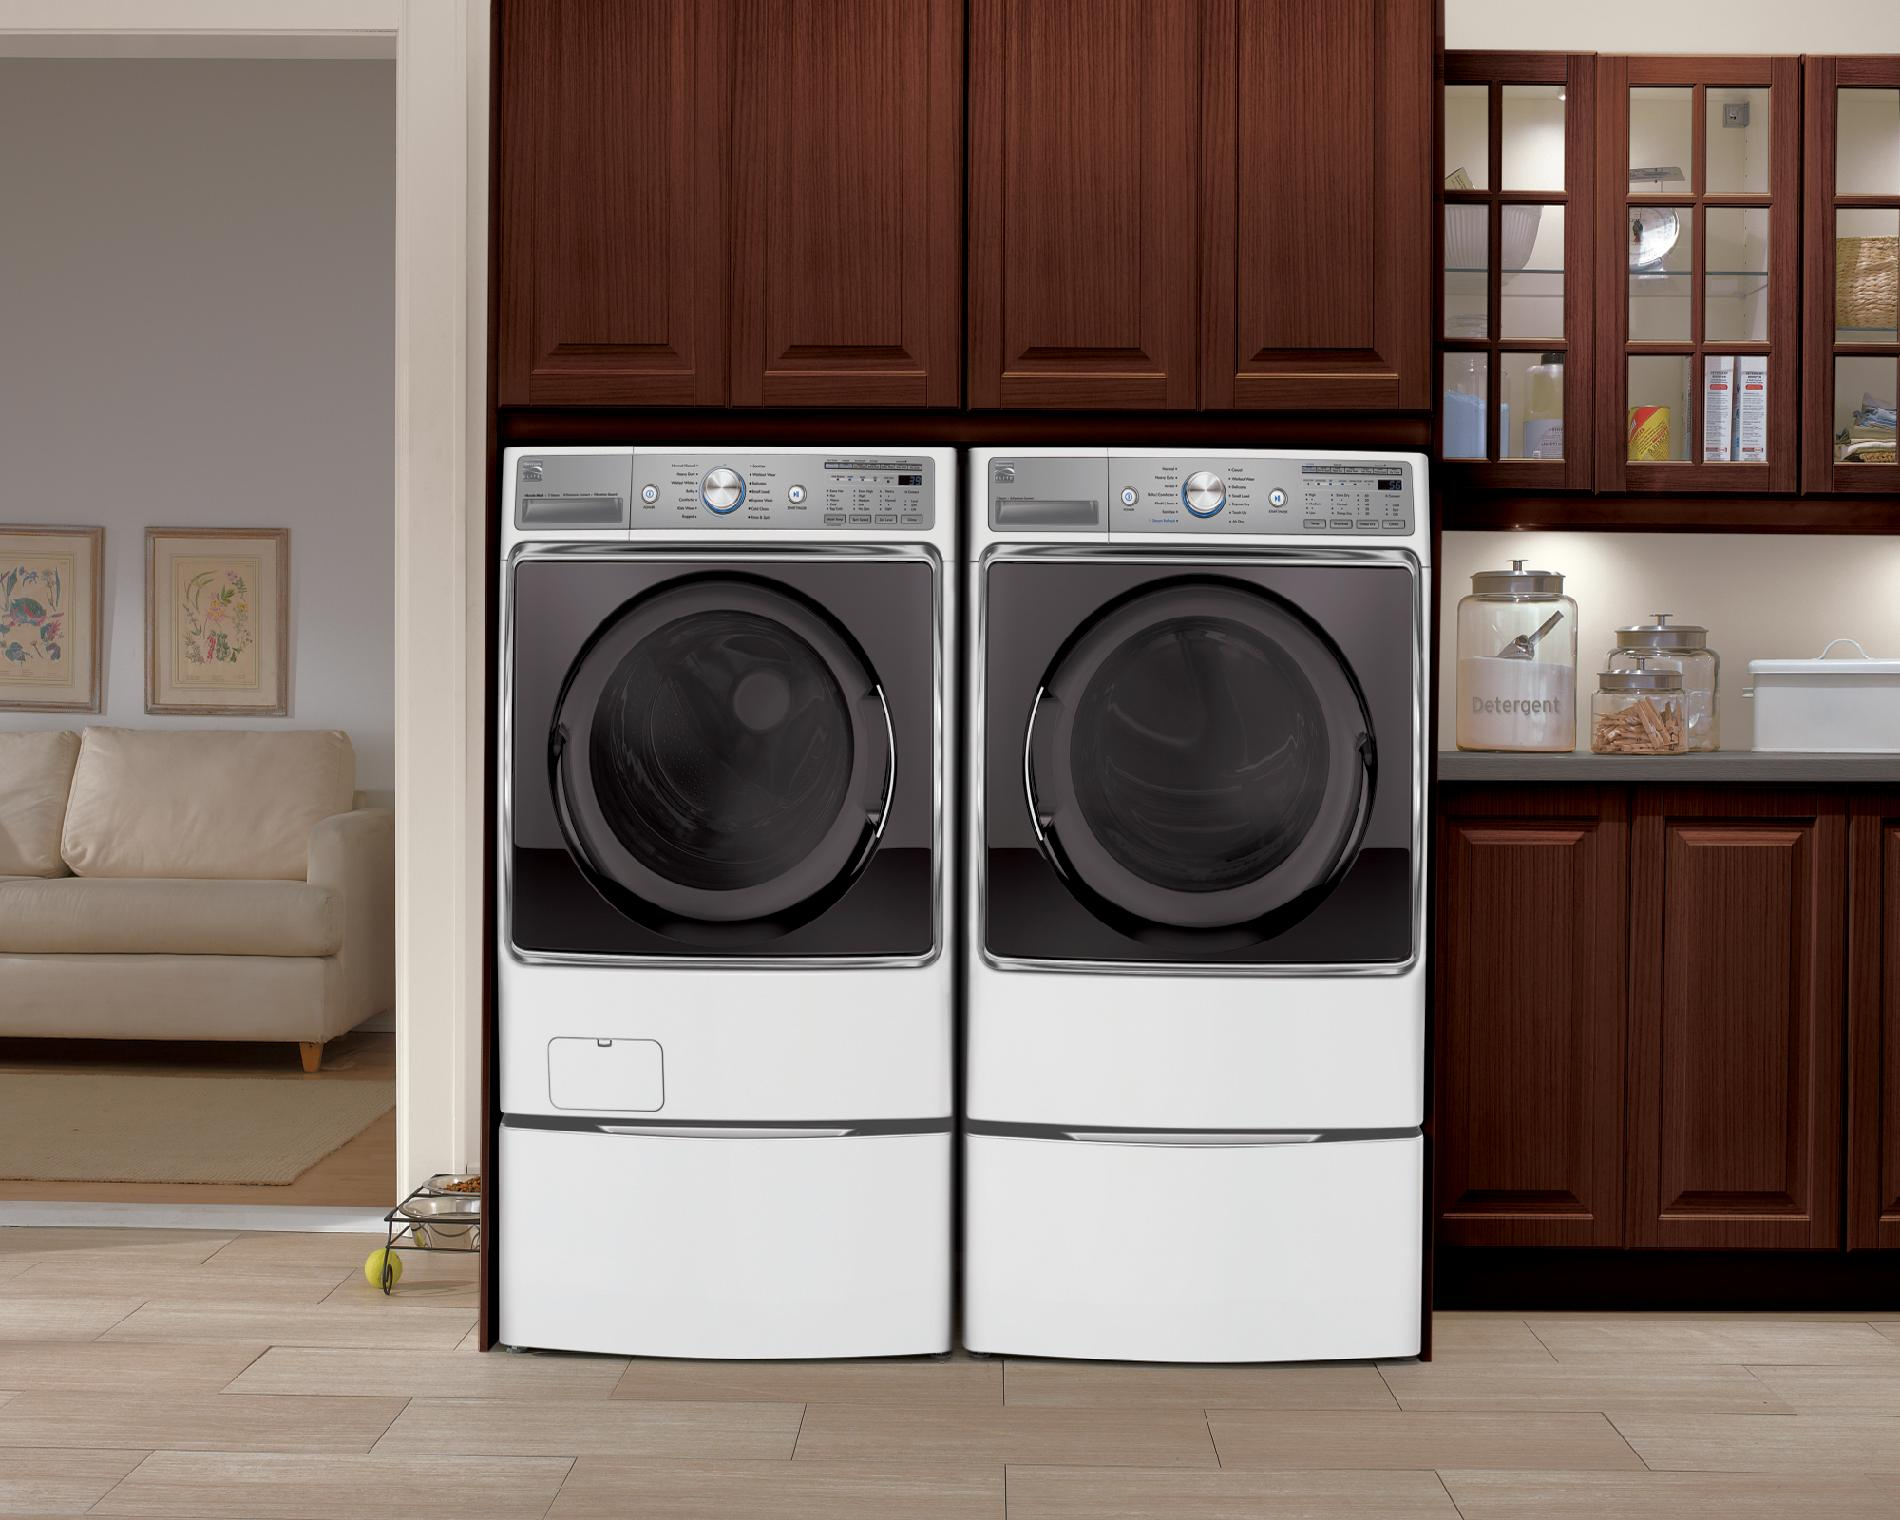 Kenmore Elite 9.0 cu. ft. Gas Dryer - White